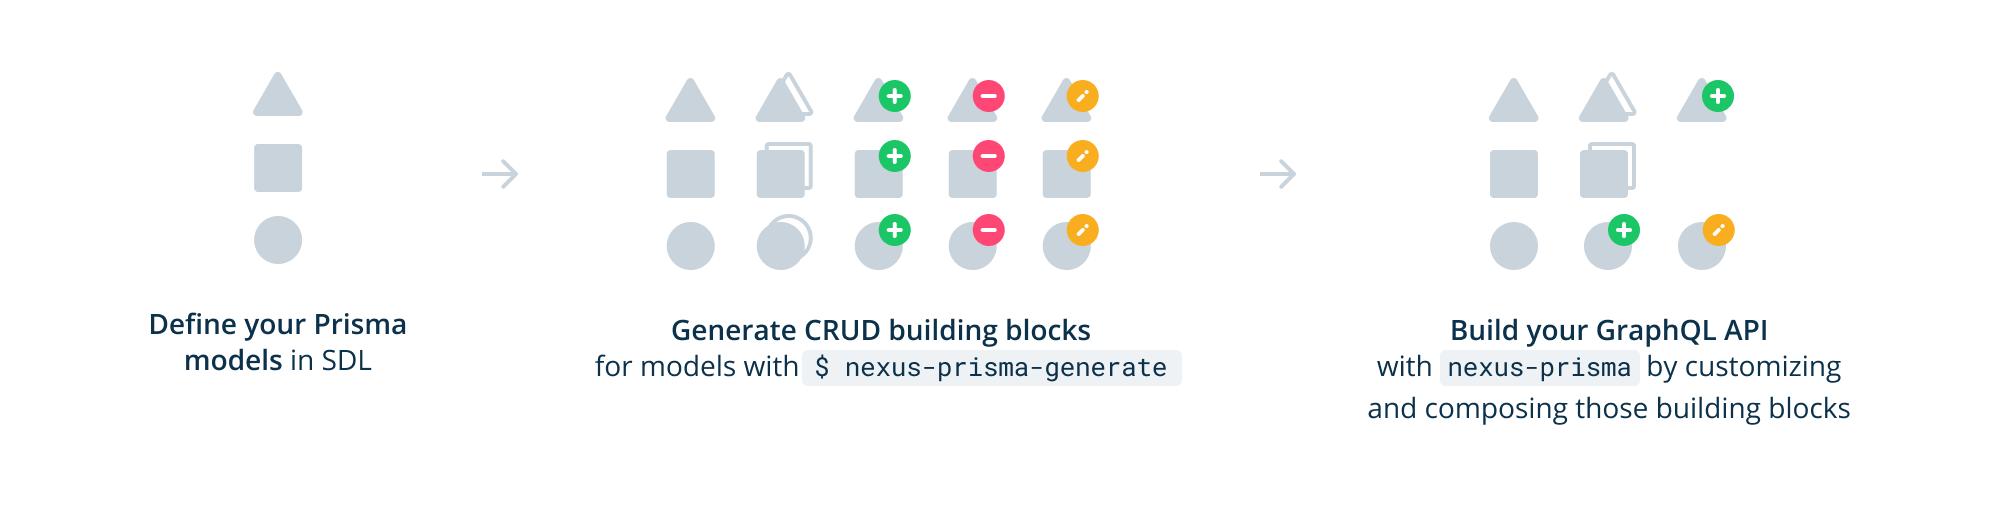 GitHub - prisma/nexus-prisma: GraphQL ORM + CRUD schema